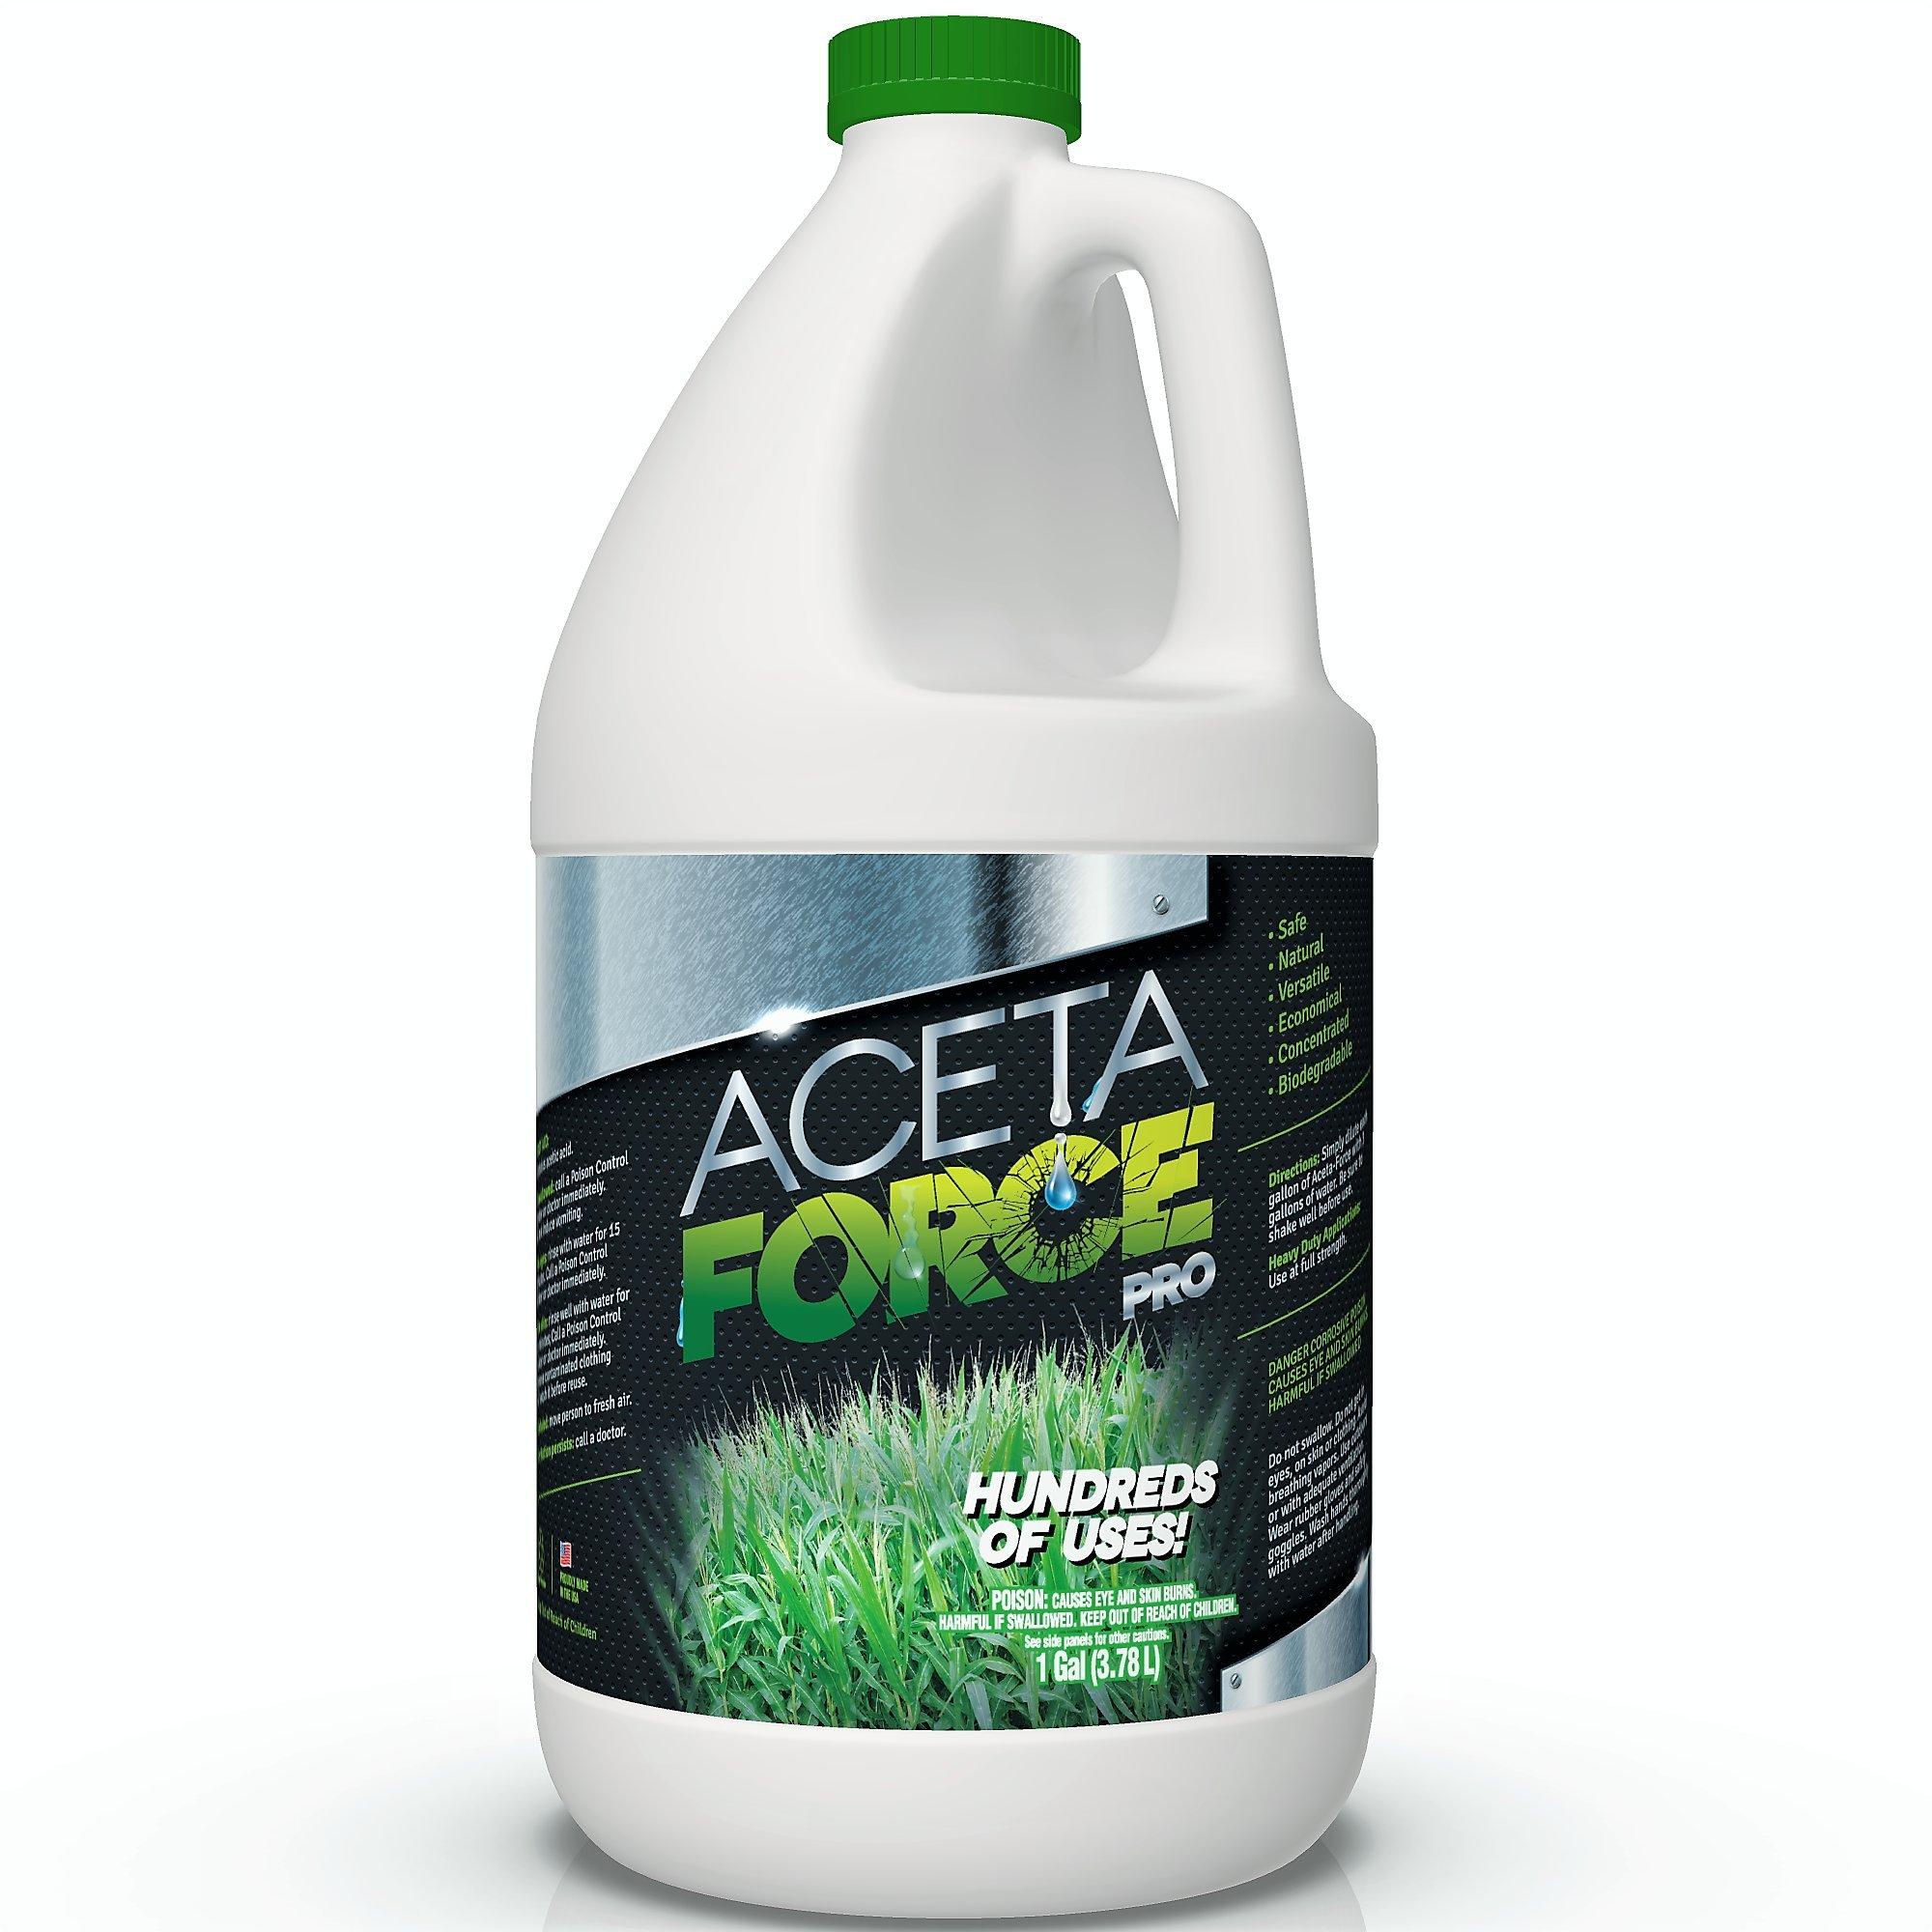 ACETA FORCE Industrial Strength 30% Natural Acetic Acid VINEGAR Multi Purpose For Home & Garden - 1 Gallon (4 x 1 Gallon Case)